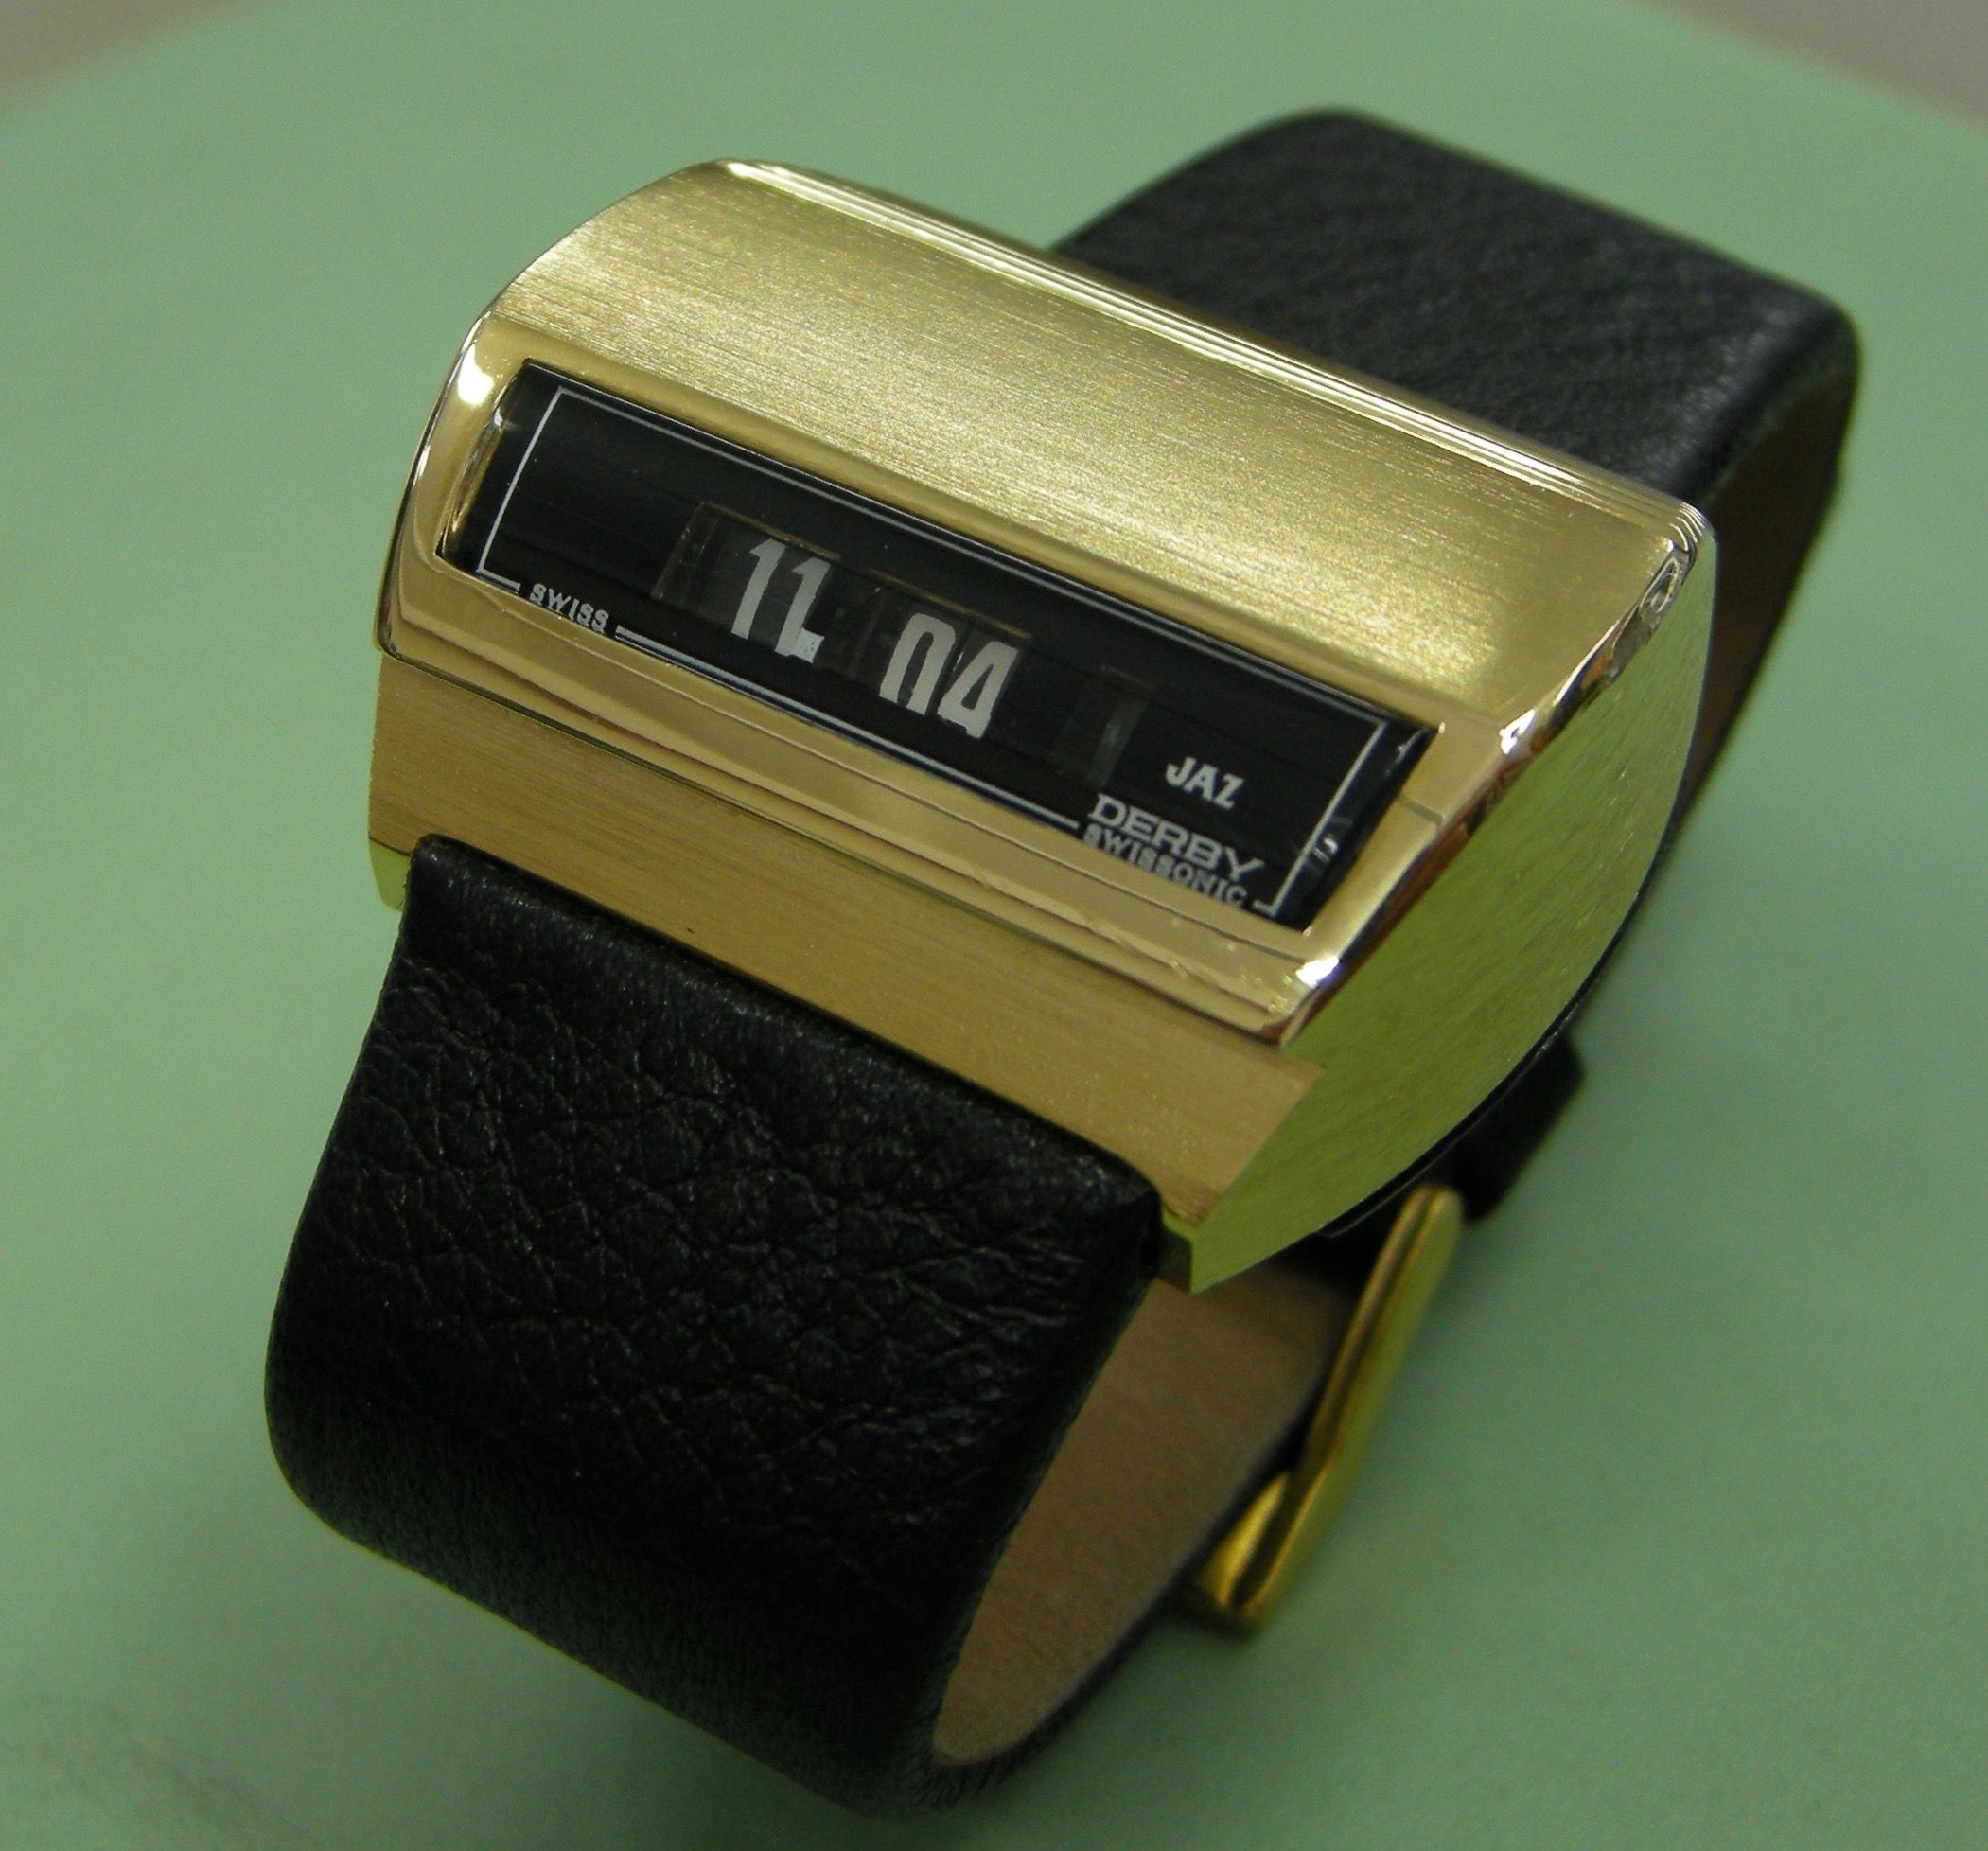 Jaz Derby electronic (not quartz) digital drivers watch also from